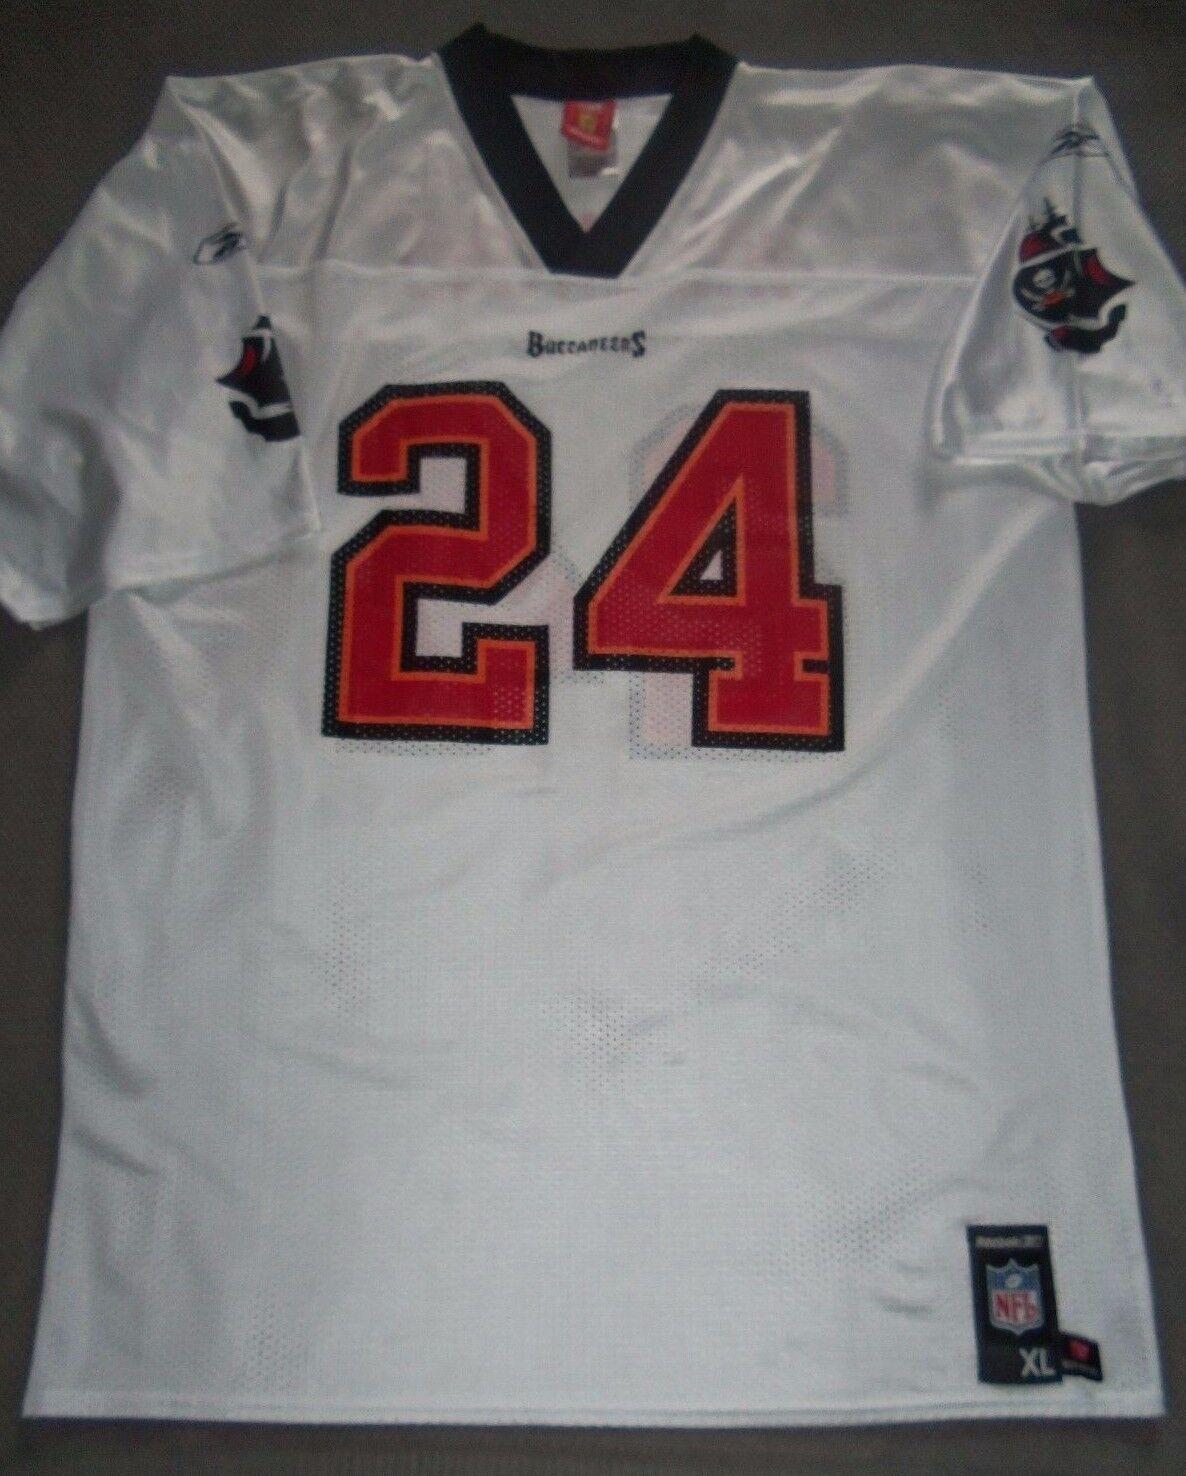 NFL Tampa Bay Buccaneers Reebok Jersey Size XL - New